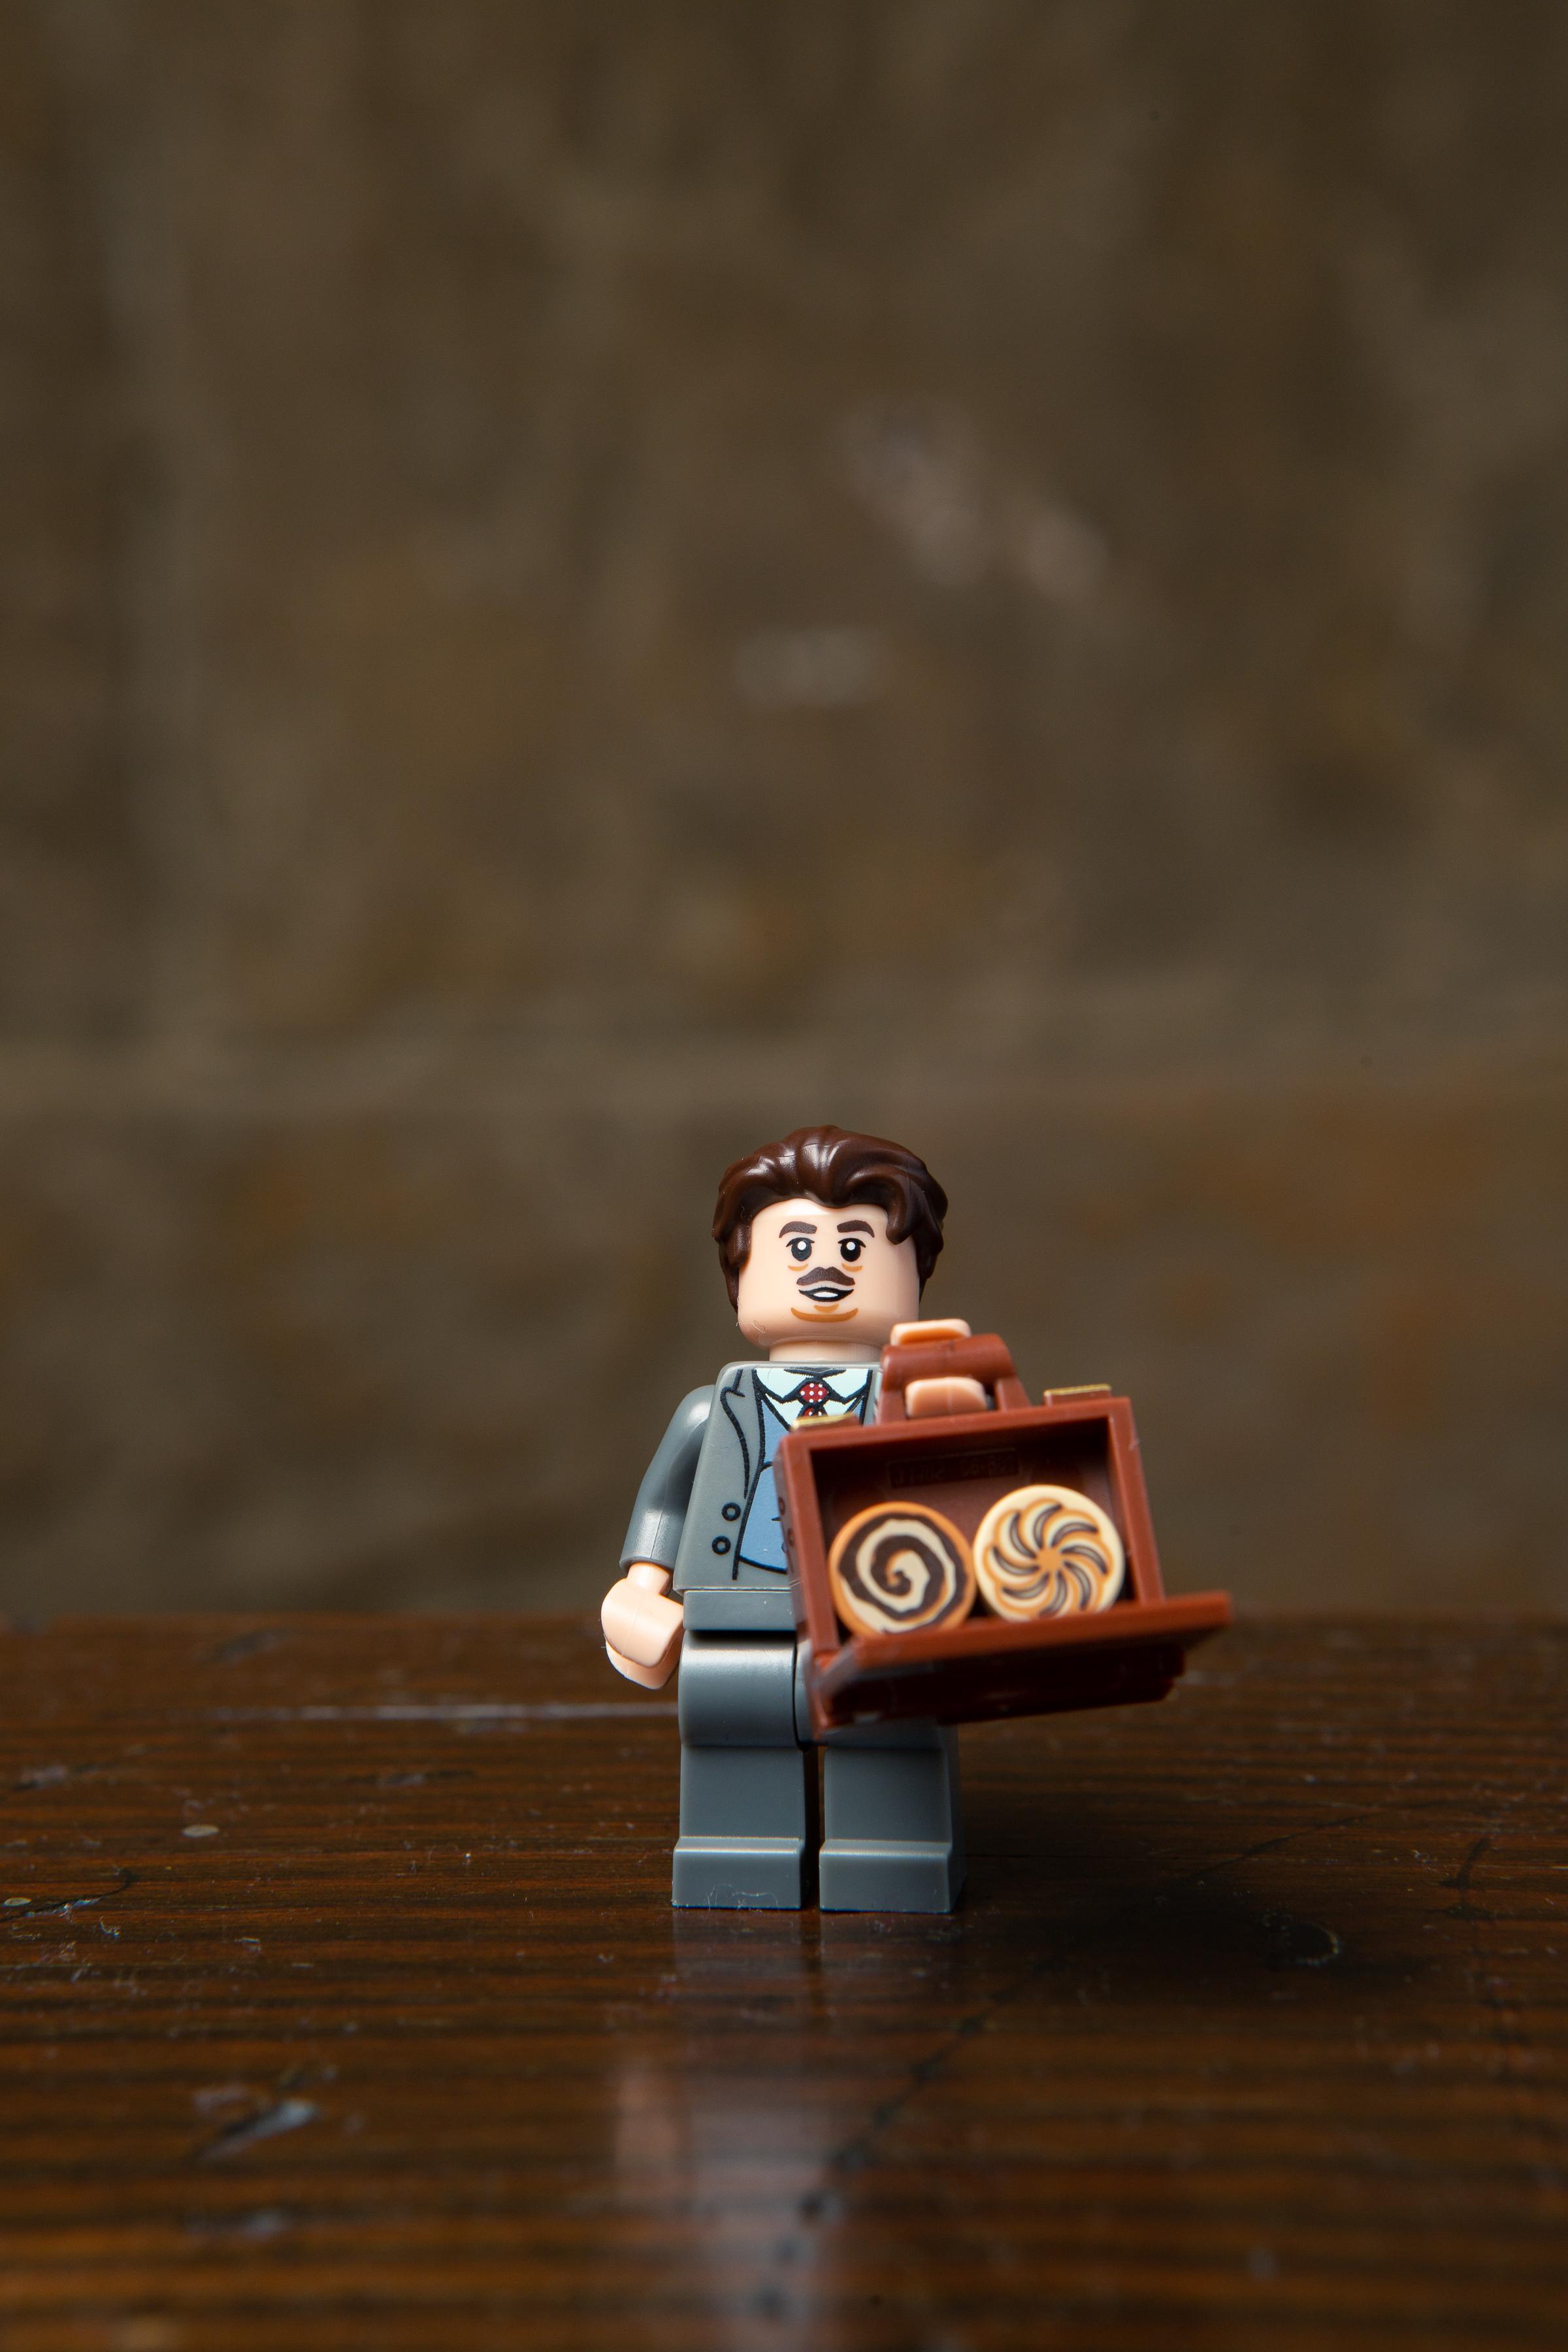 LEGO_WBST_19.06.18_hi-res-14.jpg